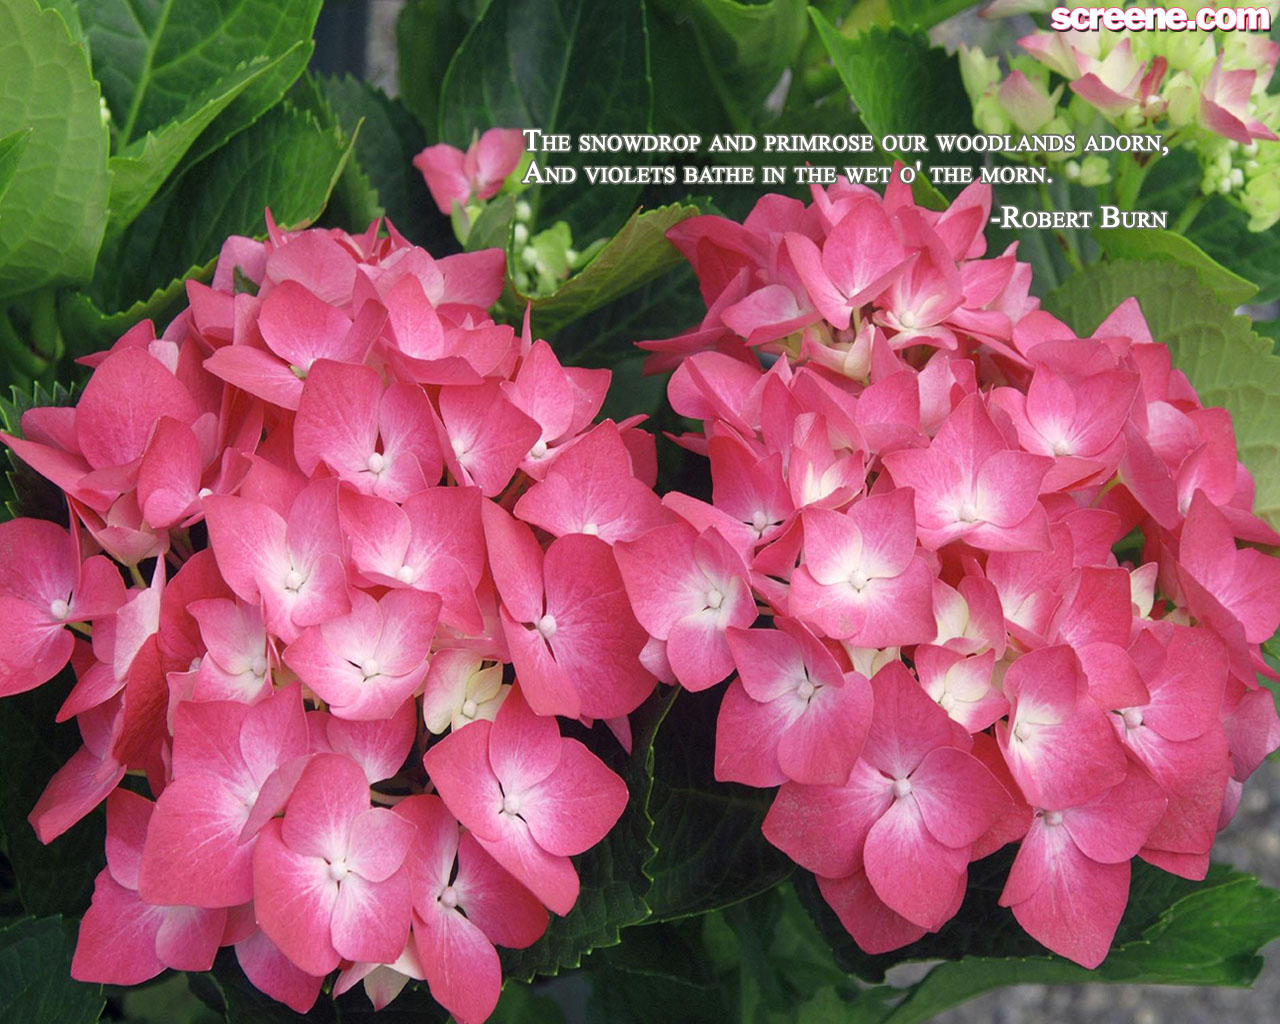 Flower Wallpaper Quotes 4 Background Hdflowerwallpaper